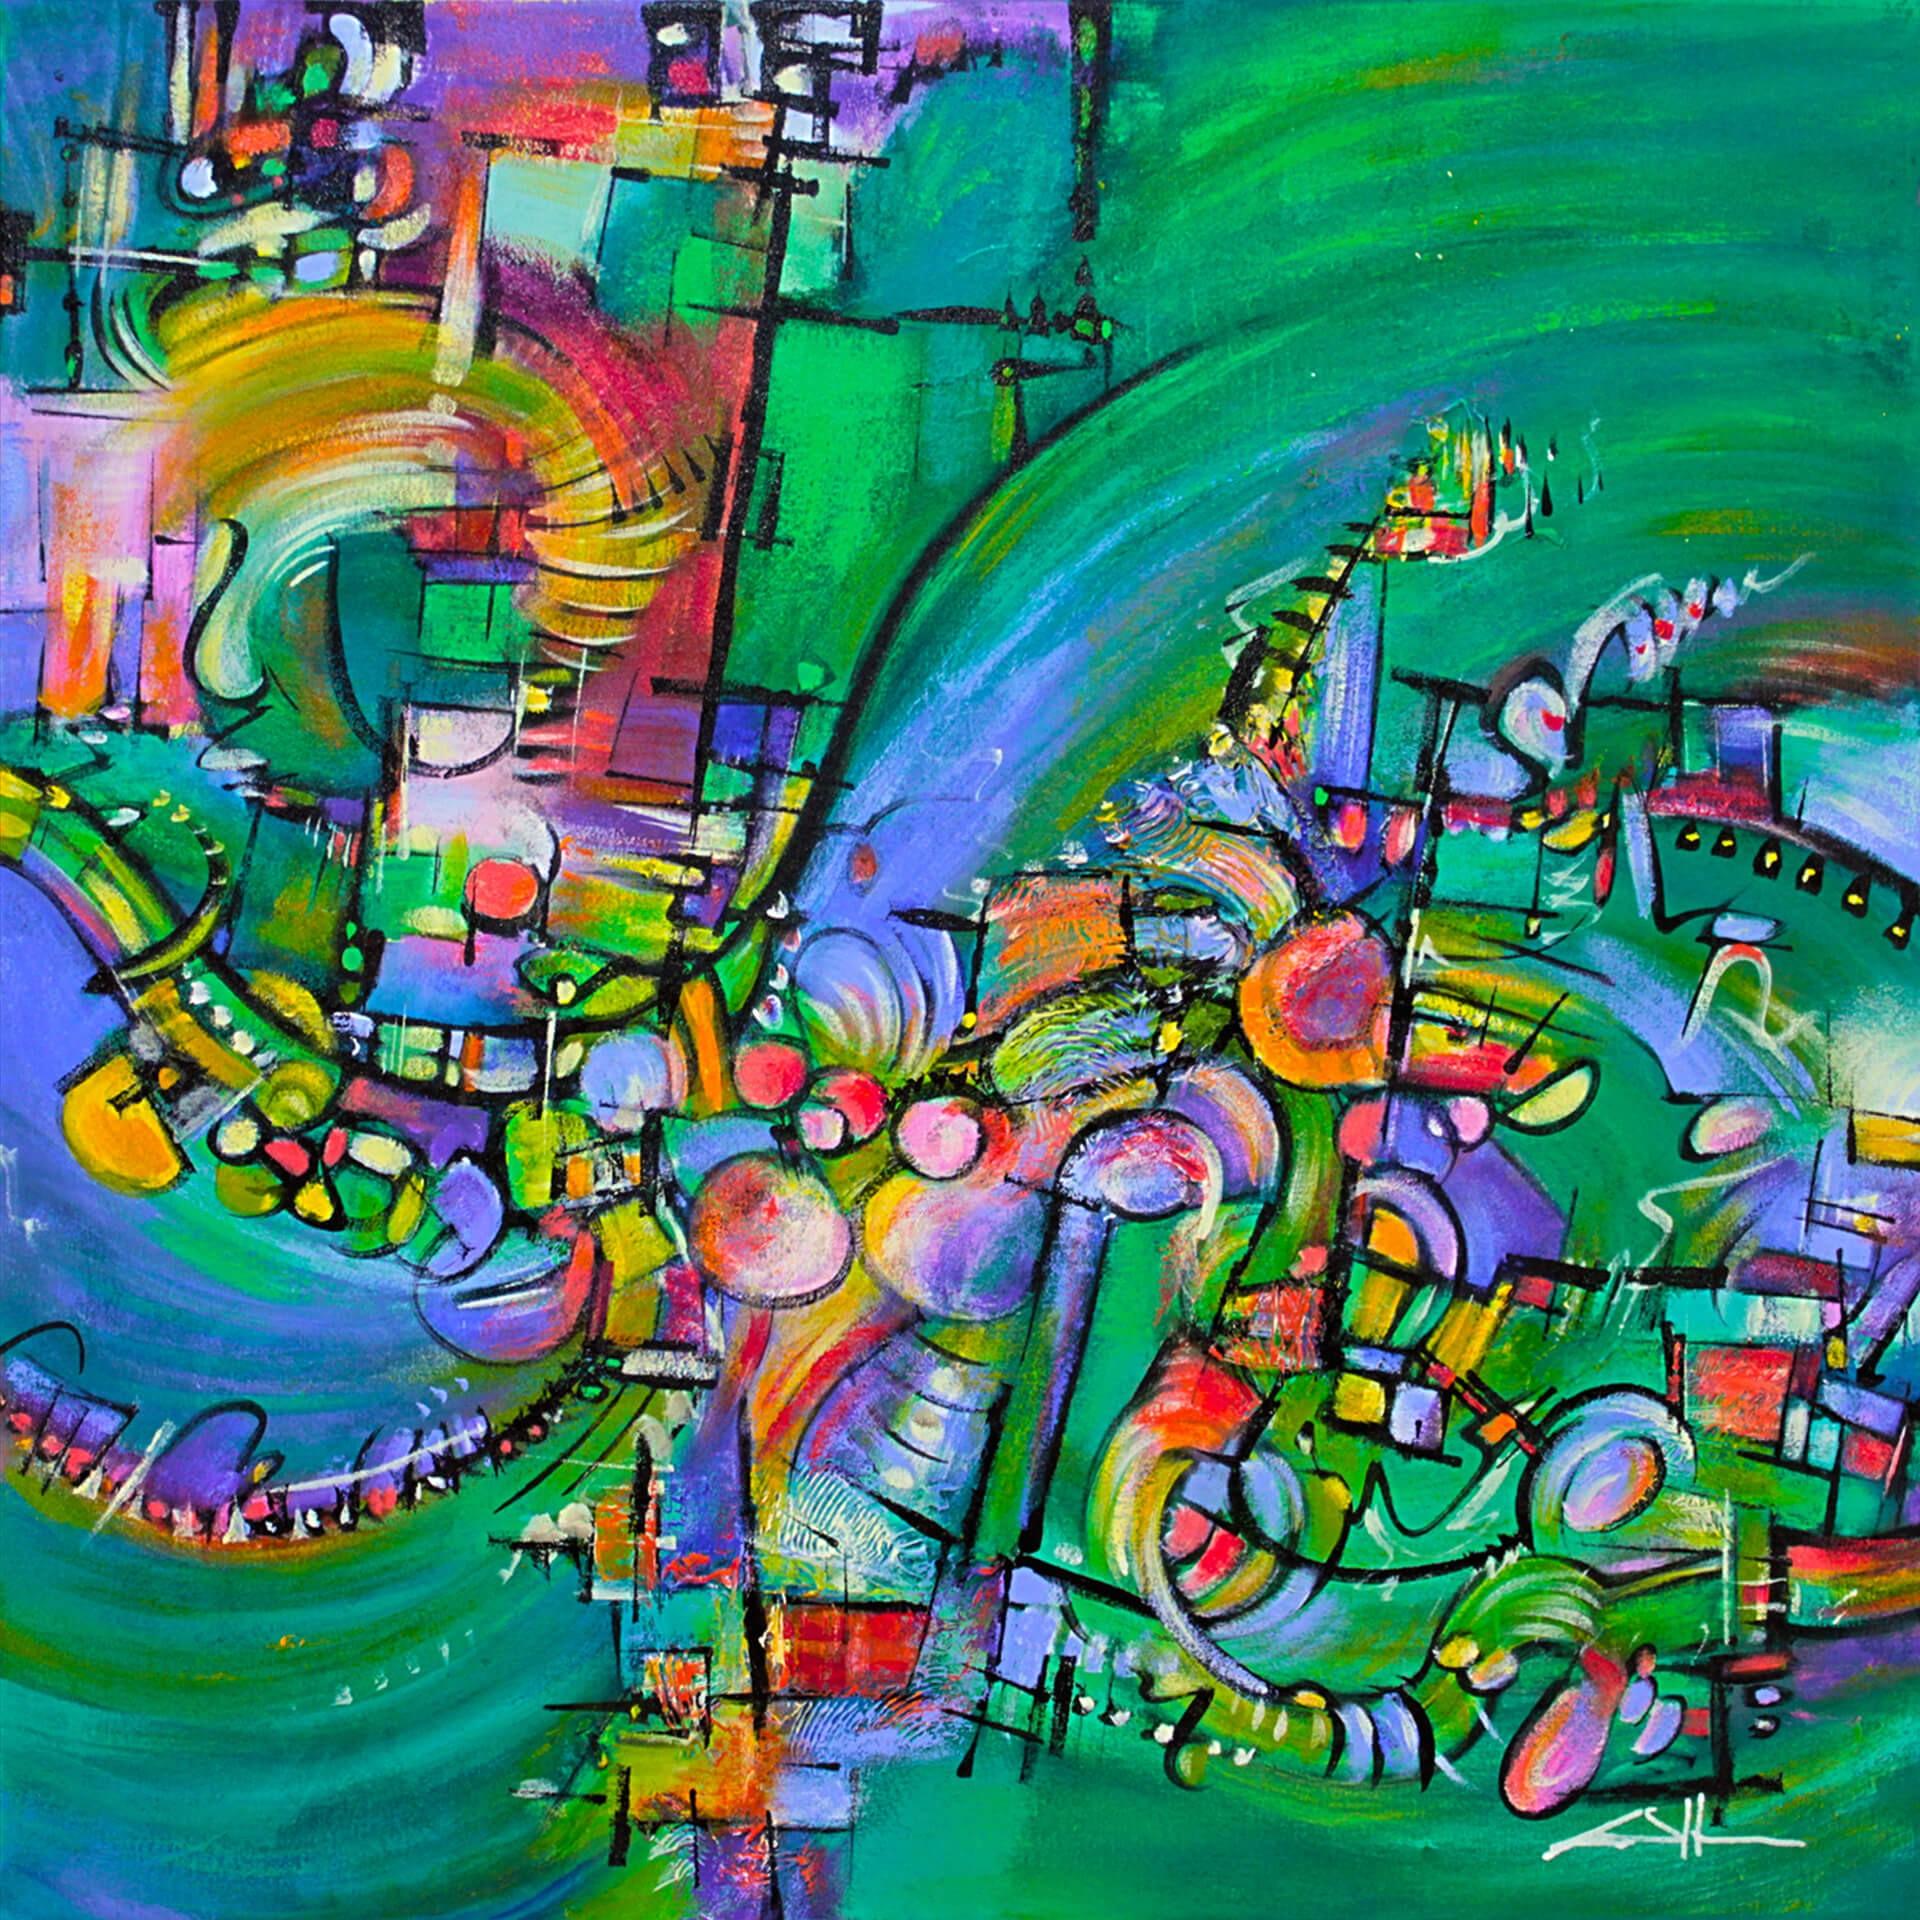 art-eric-j-hughes-artiste-peintre-canadien-tableau-symbiose-kamelemeraude-b